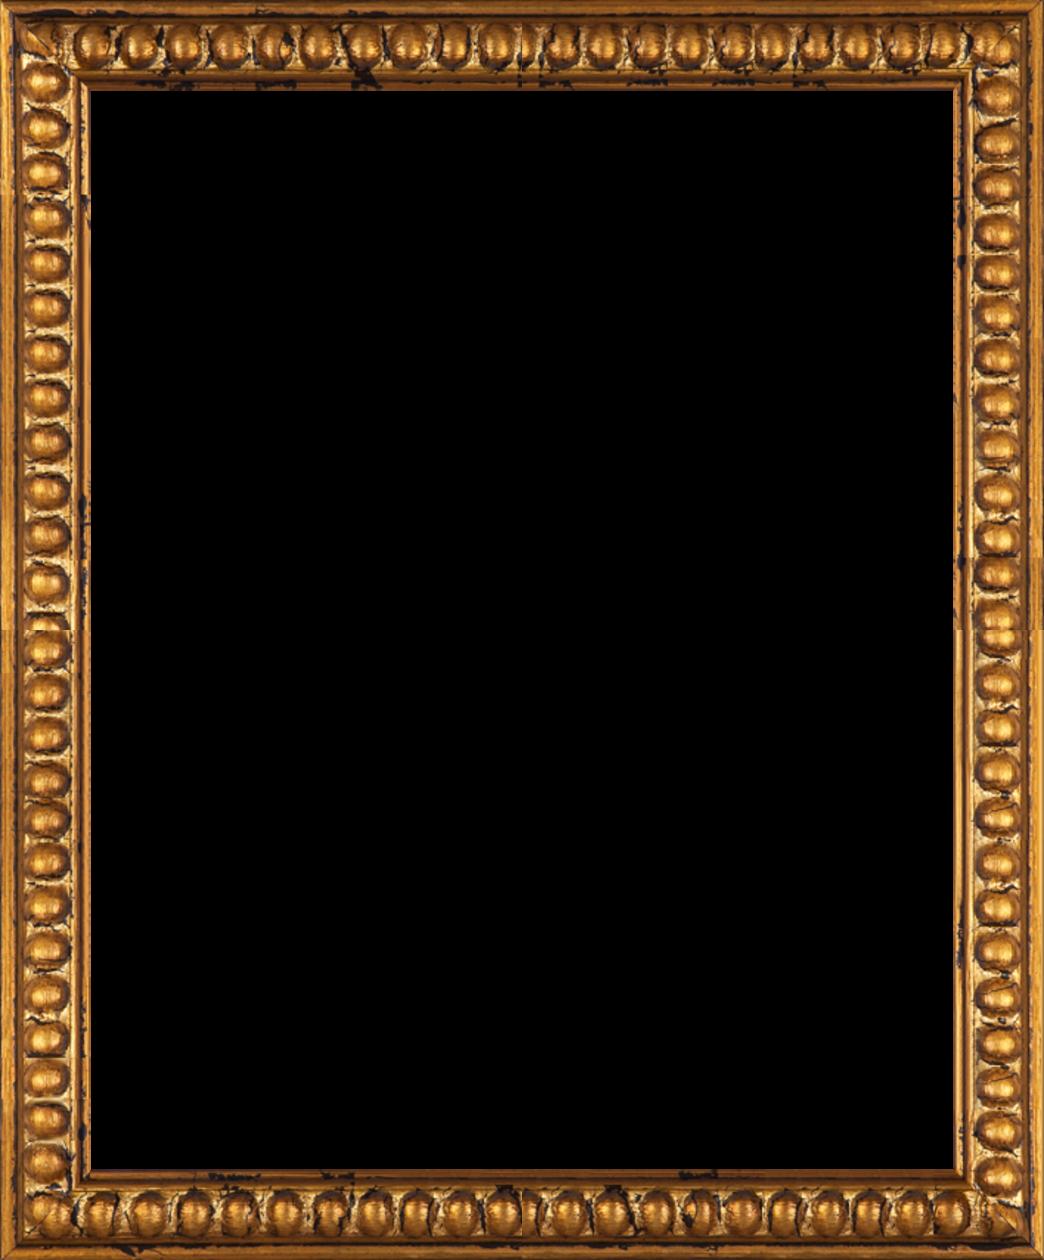 790-1426661575